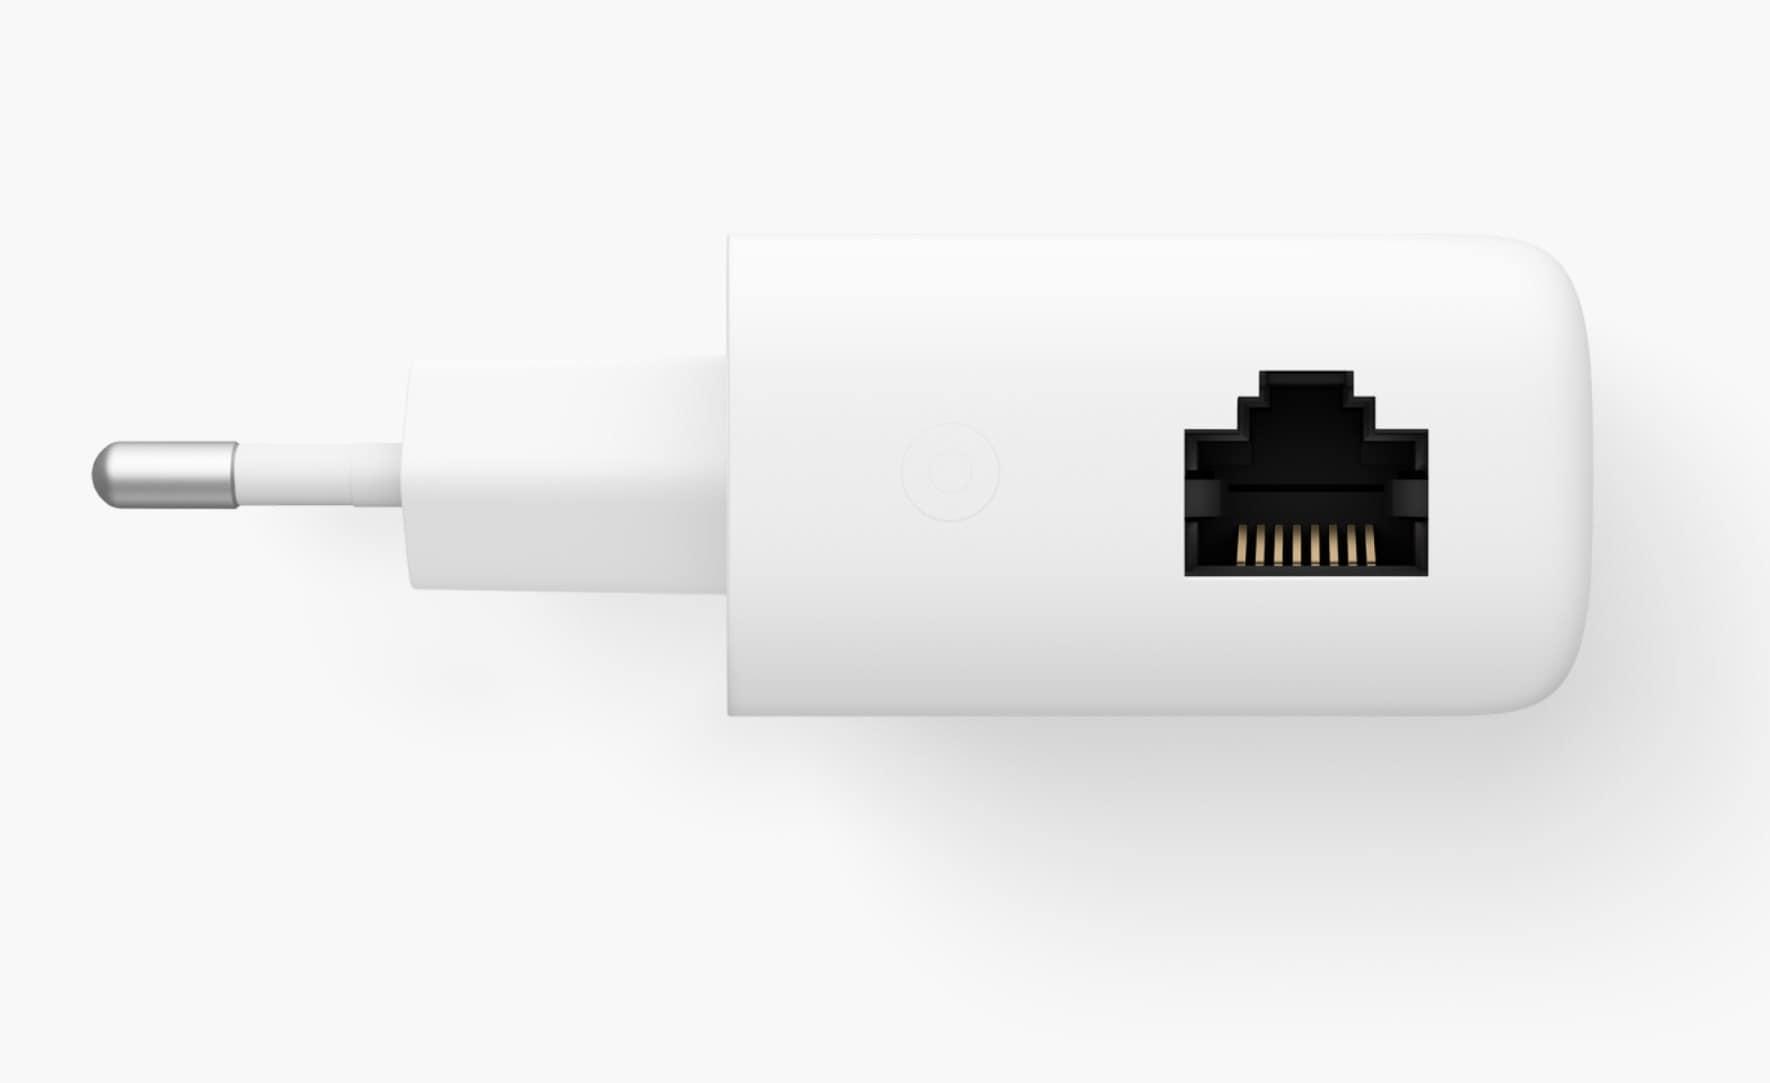 C'è un adattatore Ethernet ufficiale per Chromecast con Google TV, ma costa caro